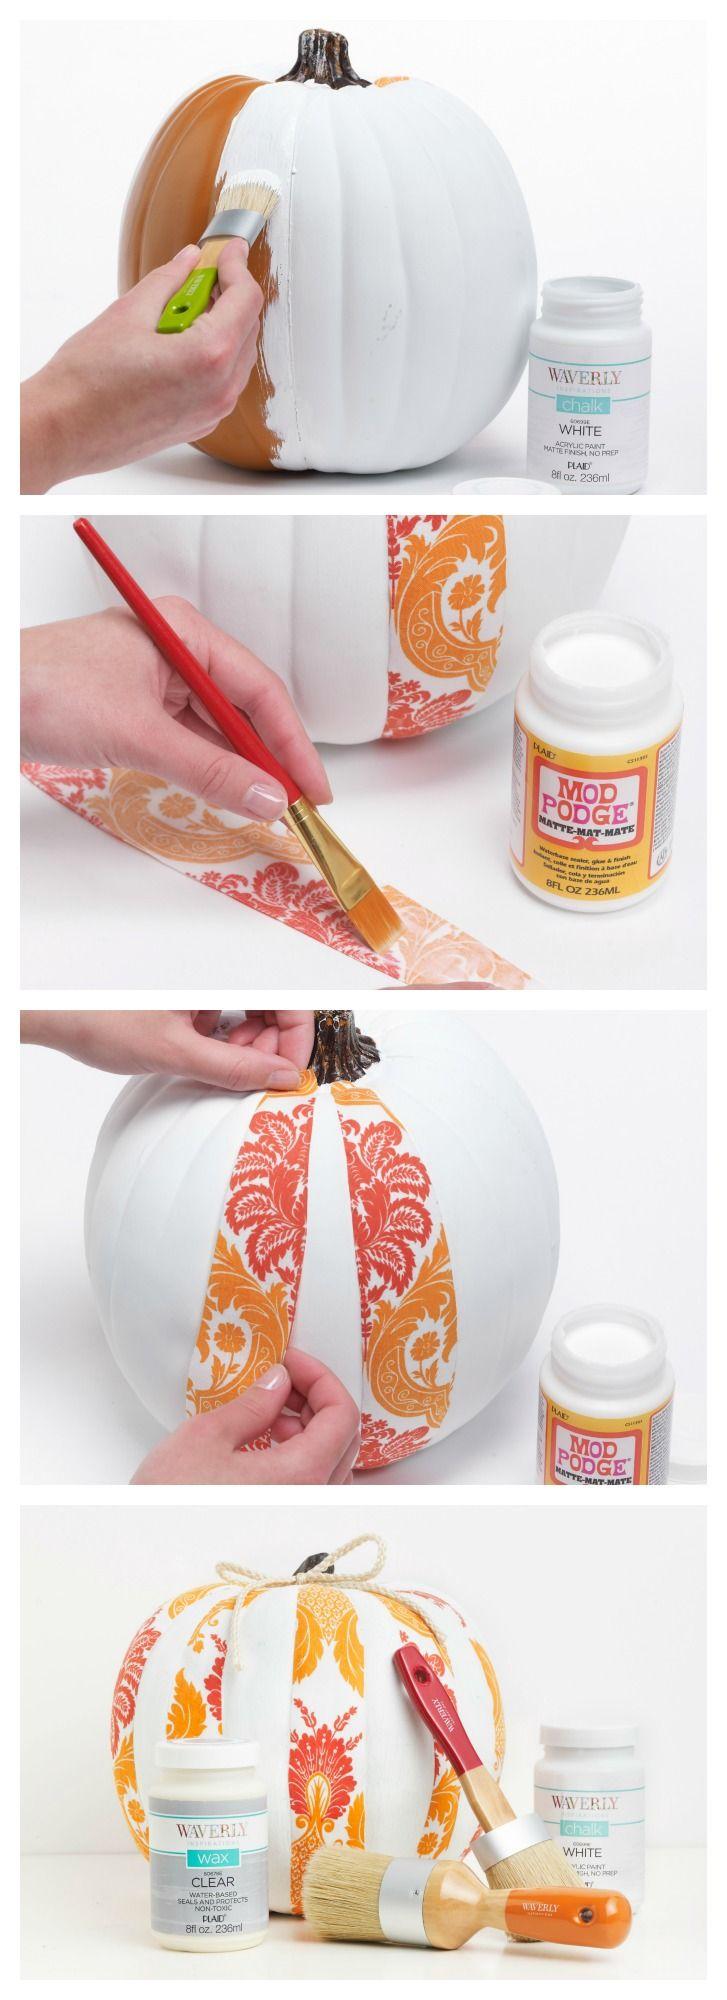 DIY Pumpkin Decor with Waverly Inspirations Fabrics - Project